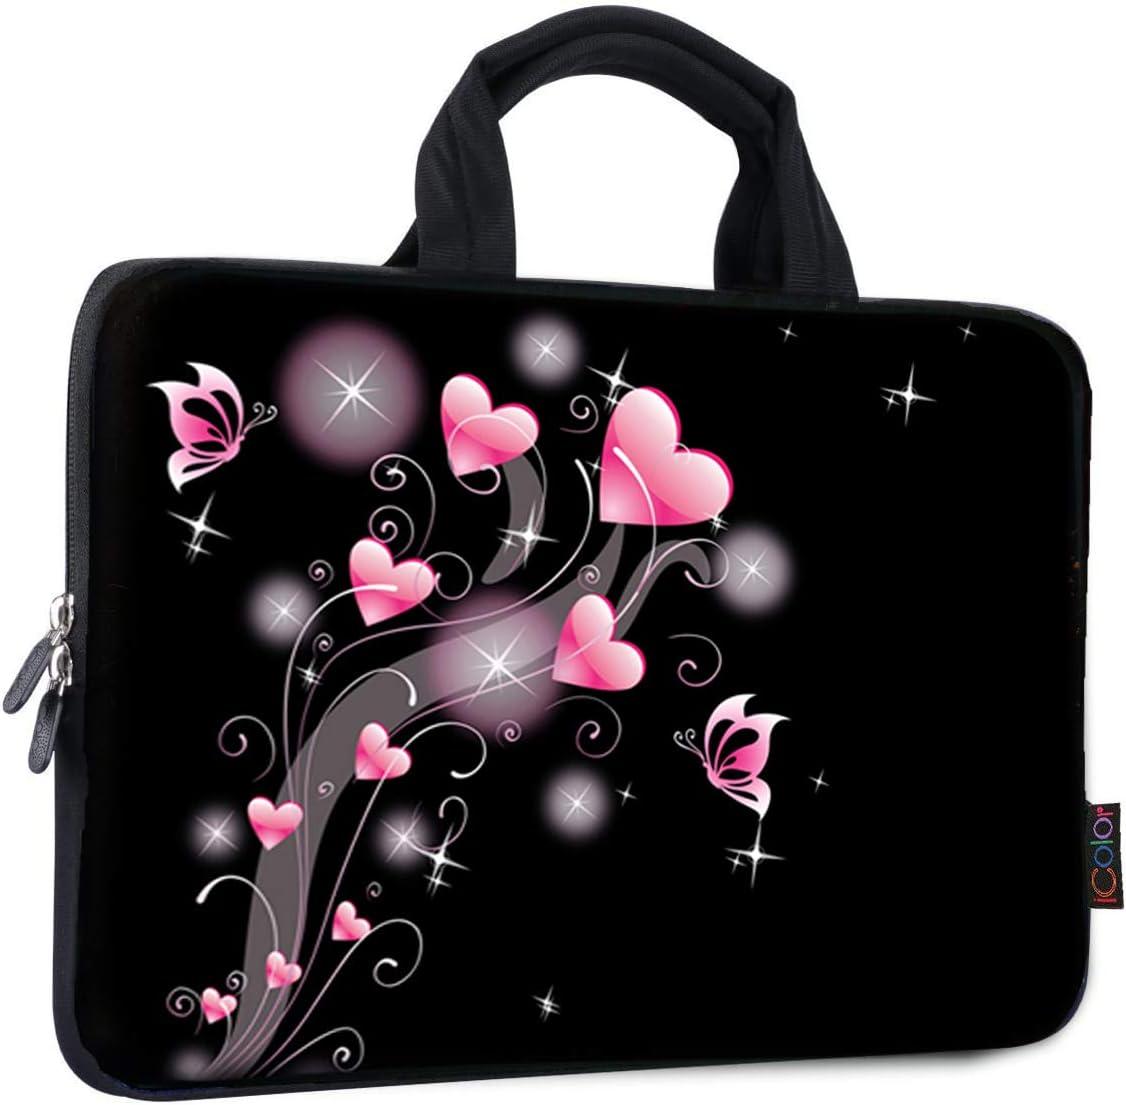 ICOLOR 11 11.6 12 12.1 12.5 inch Laptop Carrying Bag Chromebook Case Notebook Ultrabook Bag Tablet Cover Neoprene Laptop Sleeve case chromebook Sleeve with Handle Kids Boys Girls Pink Heart